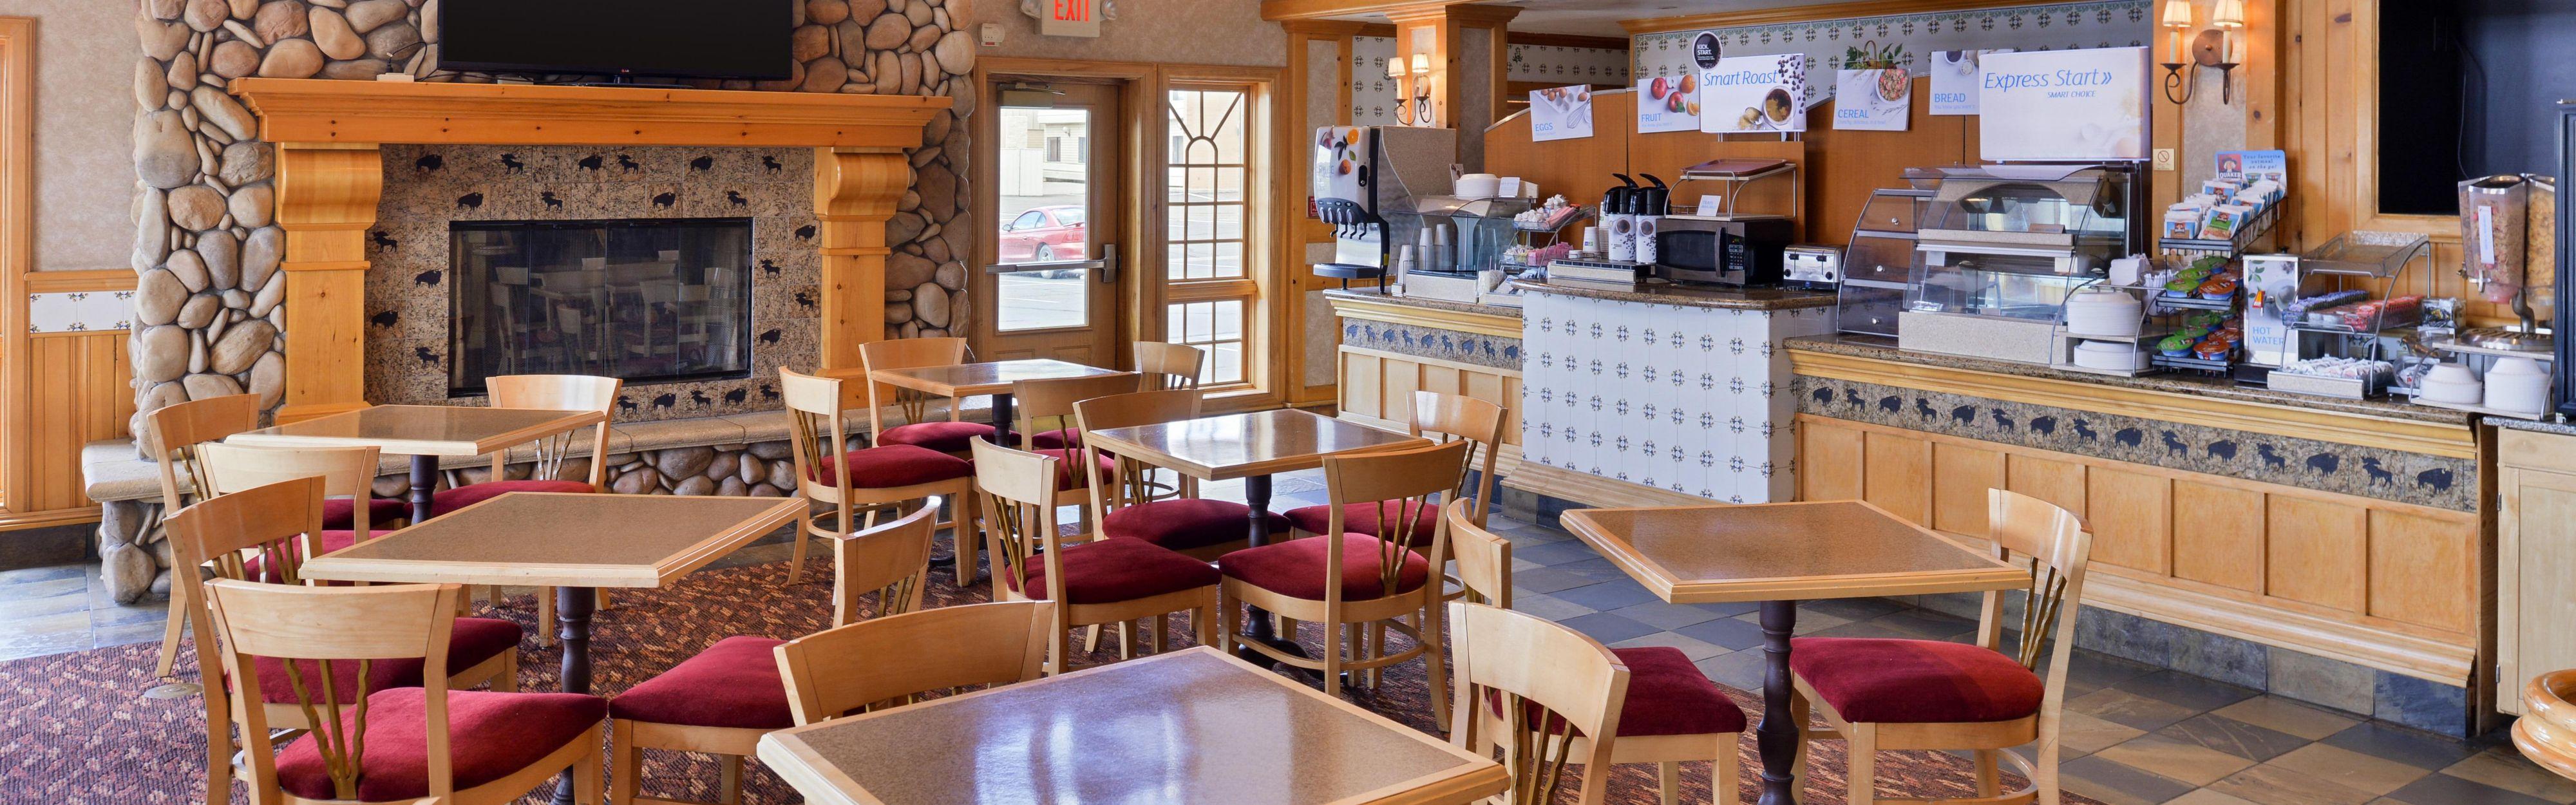 Holiday Inn Express & Suites Elko image 2